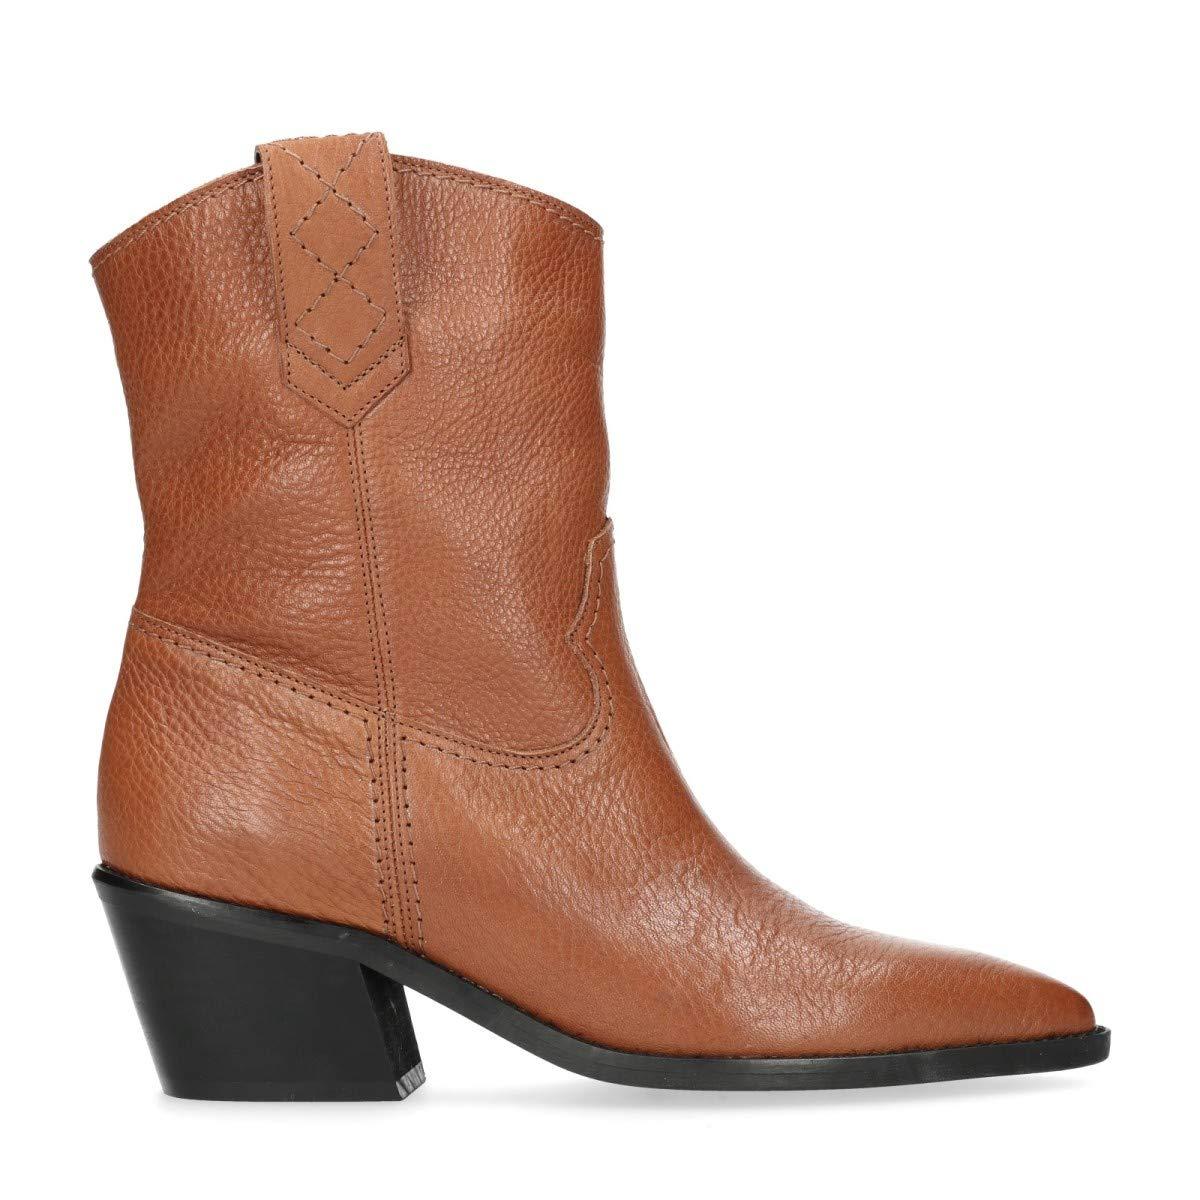 new styles 88ce2 84e9d Sacha Schuhe Damen Cowboystiefel Western Leder Farbe Schwarz ...